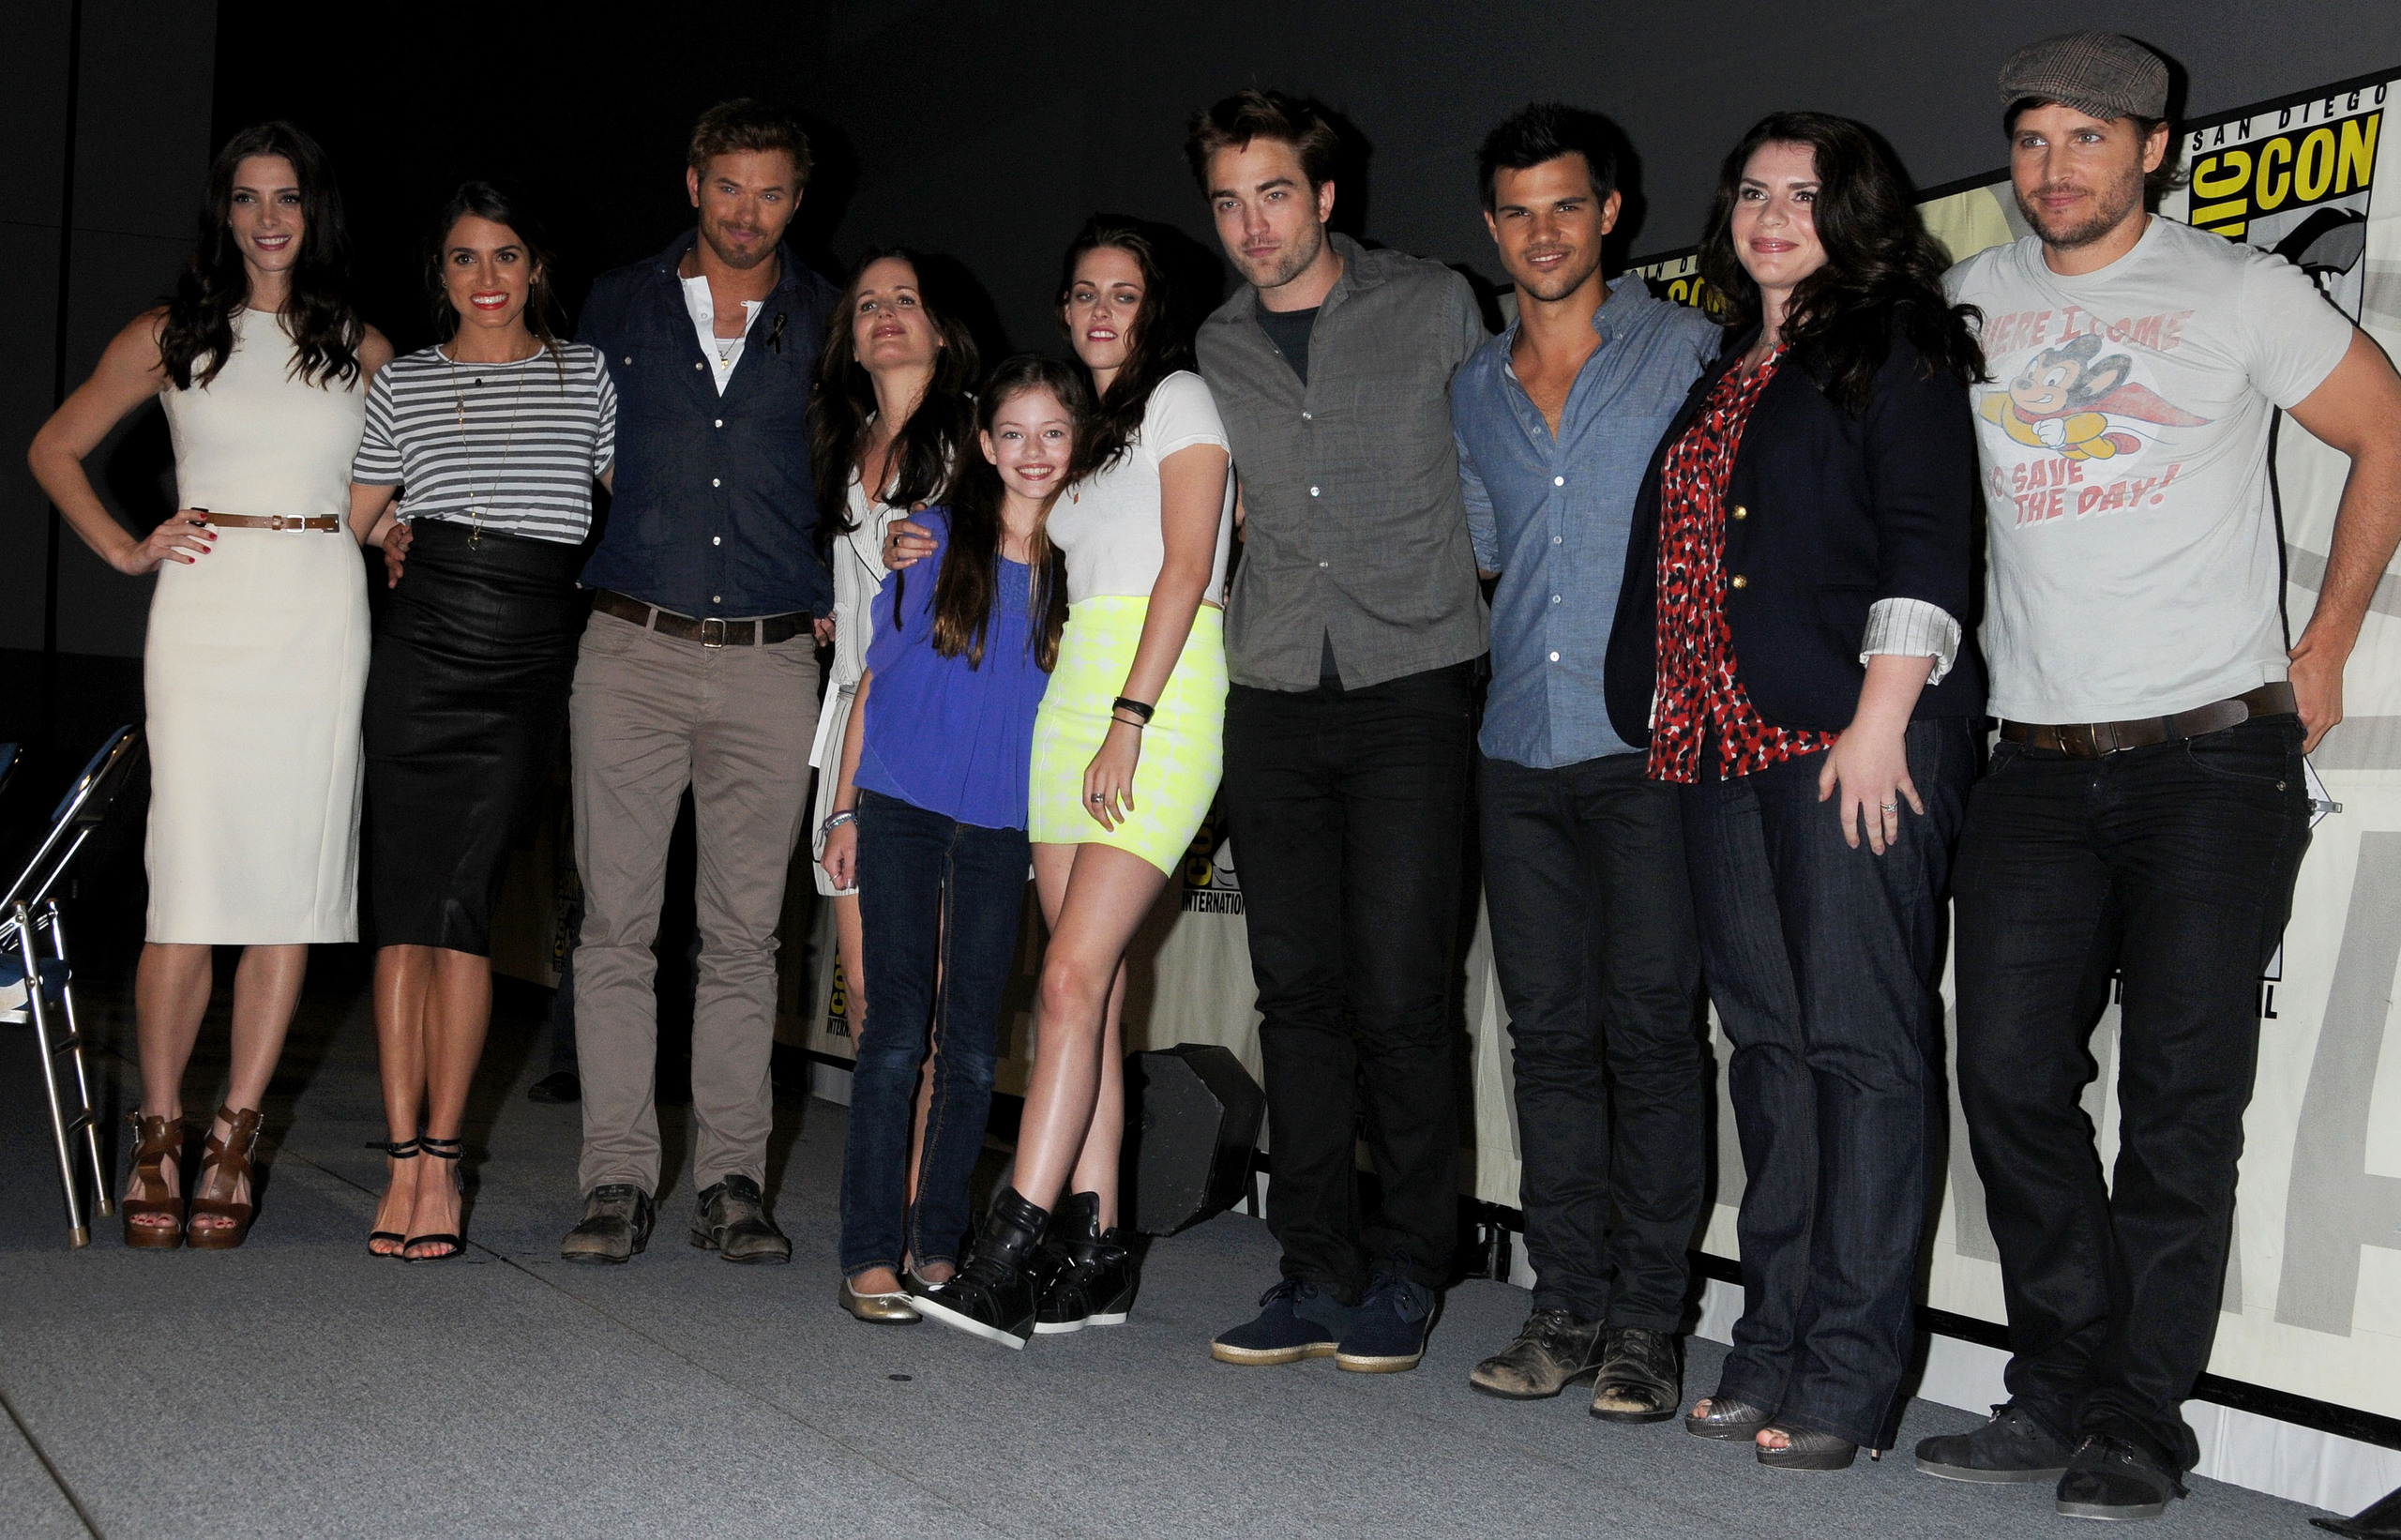 http://images5.fanpop.com/image/photos/31400000/Nikki-at-Comic-Con-2012-Twilight-Saga-Breaking-Dawn-Part-2-panel-12-07-12-nikki-reed-31454057-2560-1642.jpg